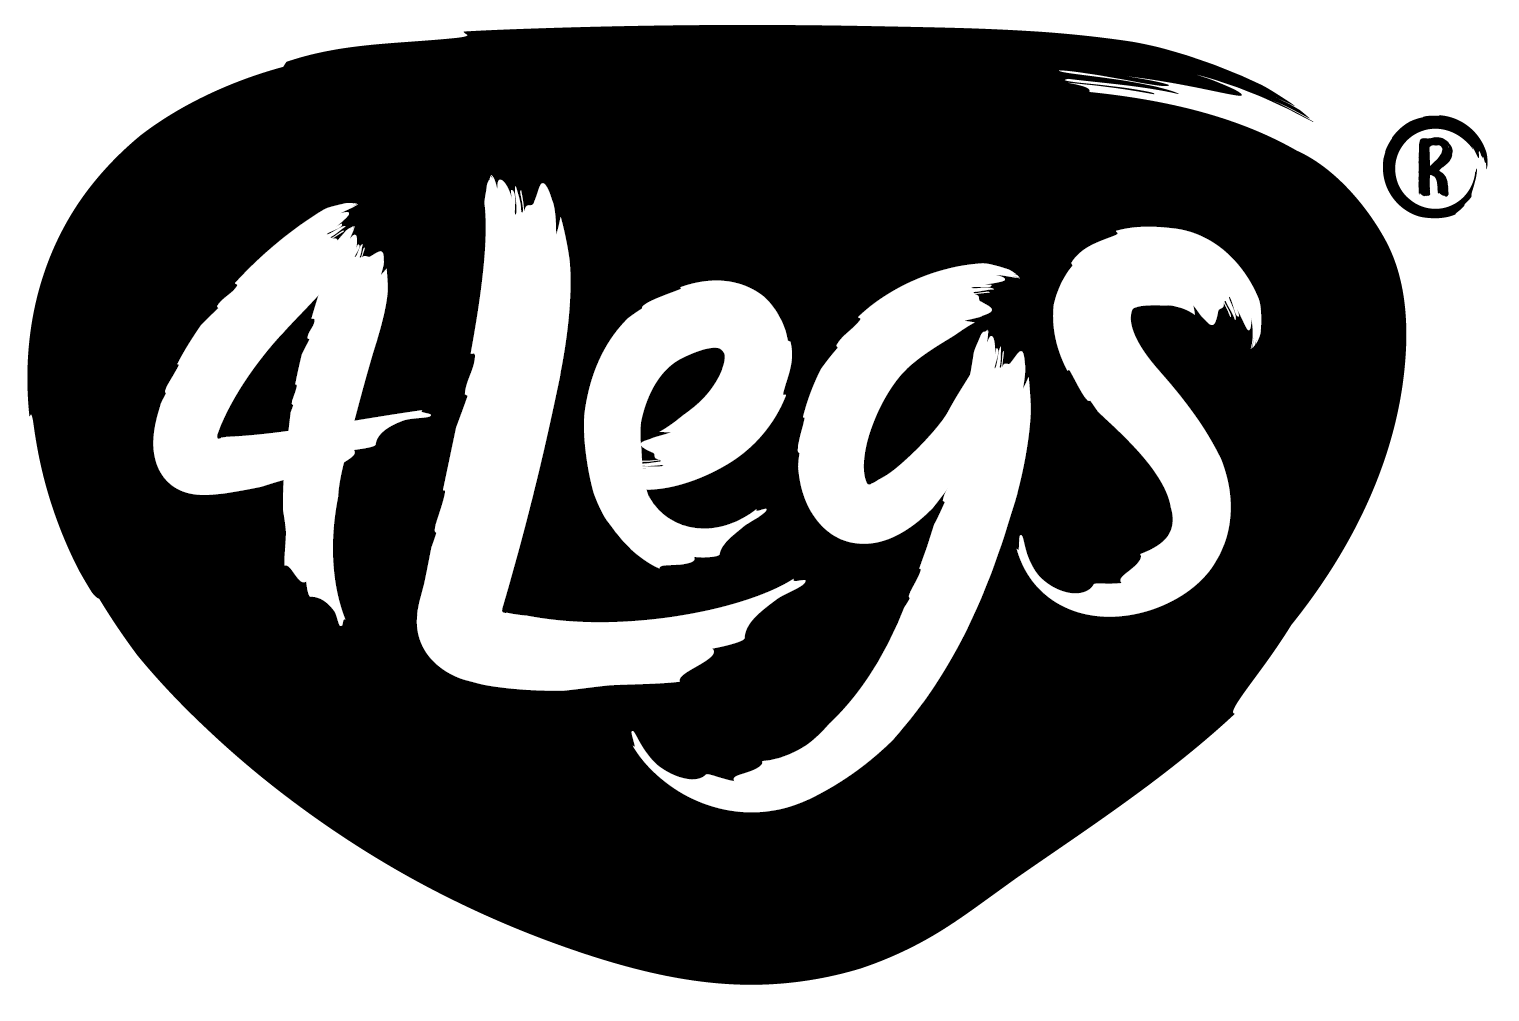 Client_1_-_4legs-logo